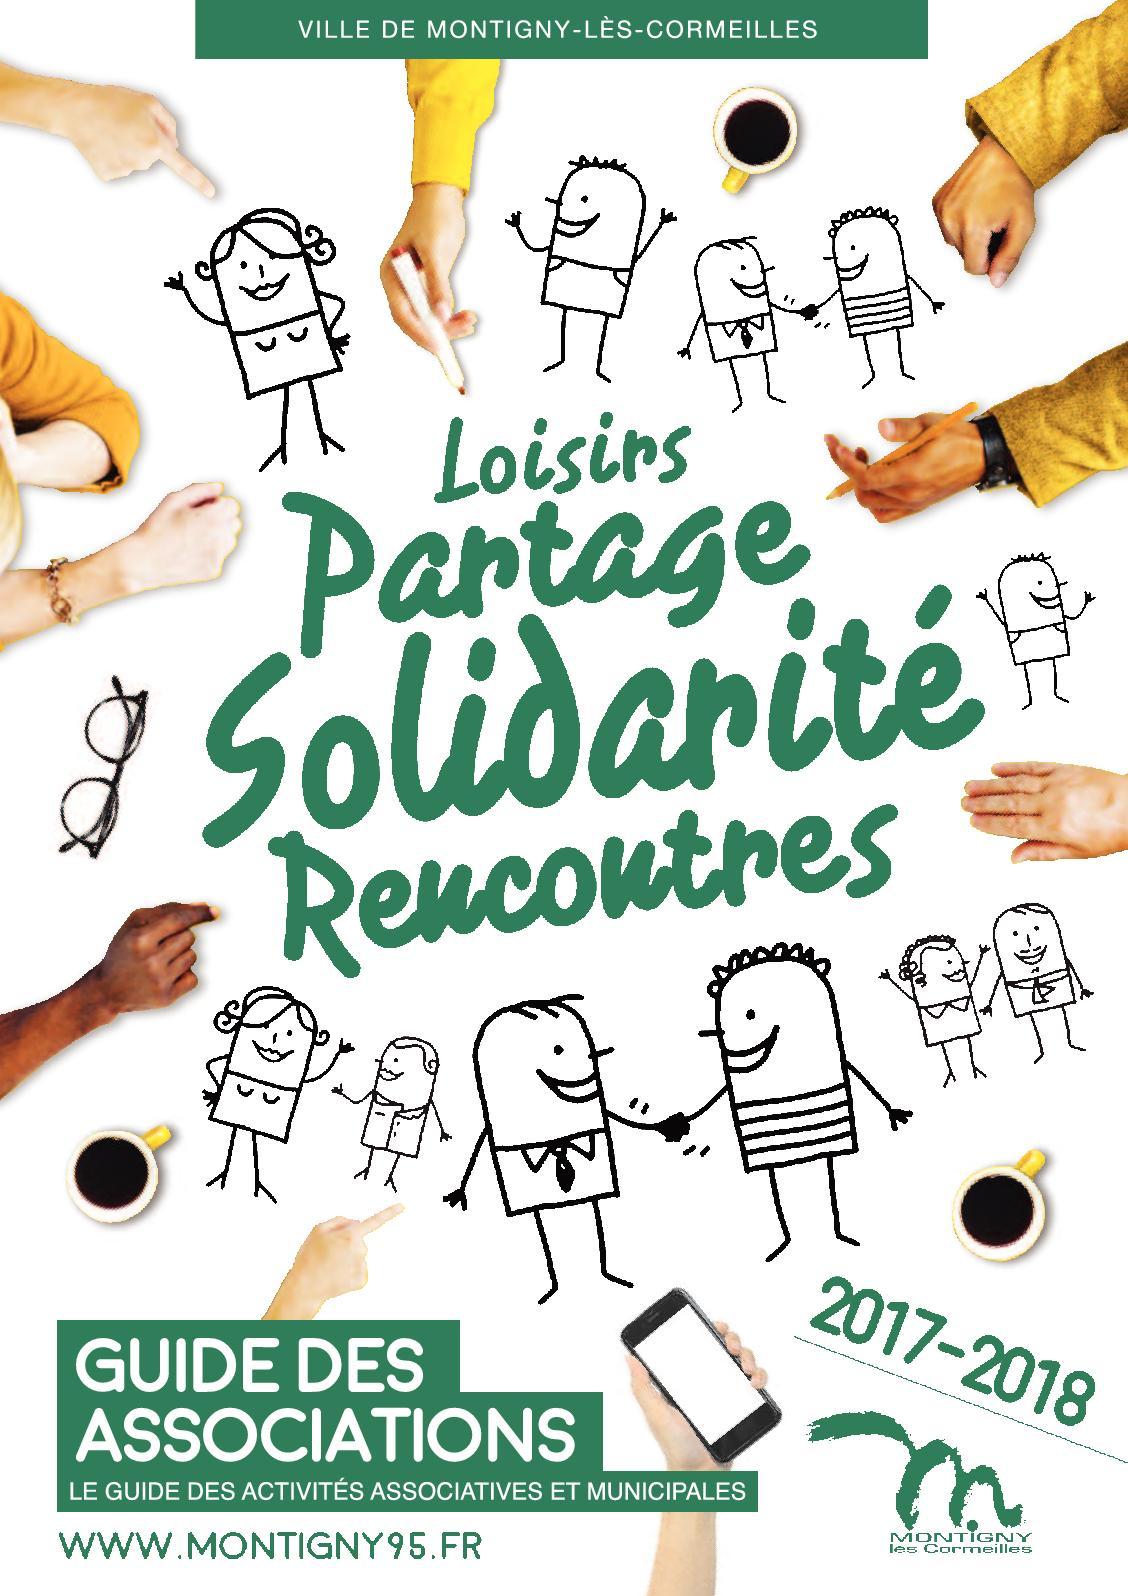 Calaméo - Guide Des Associations 2017 2018